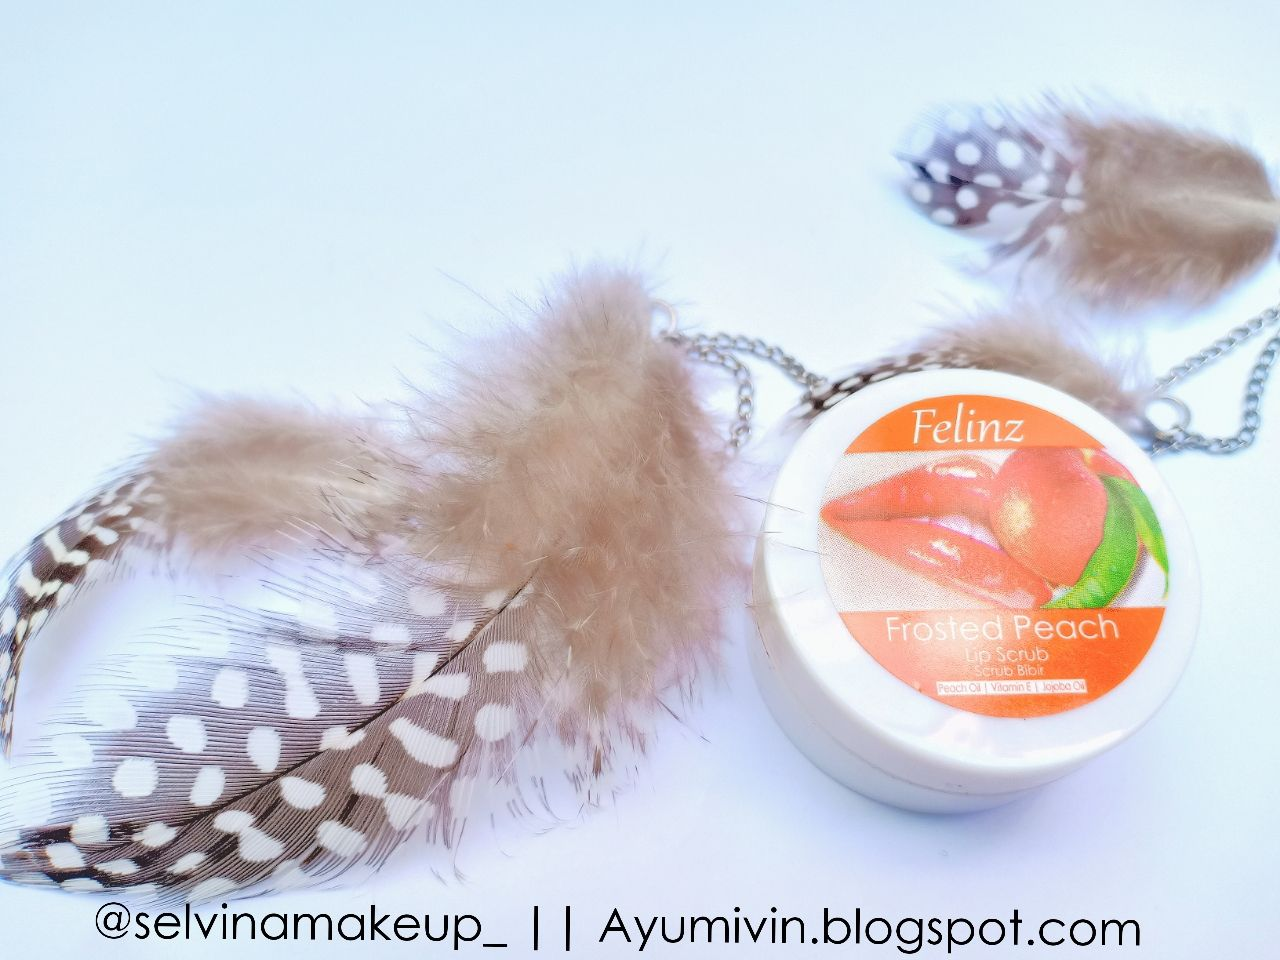 gambar review ke-1 untuk Felinz Lip Scrub Frosted Peach